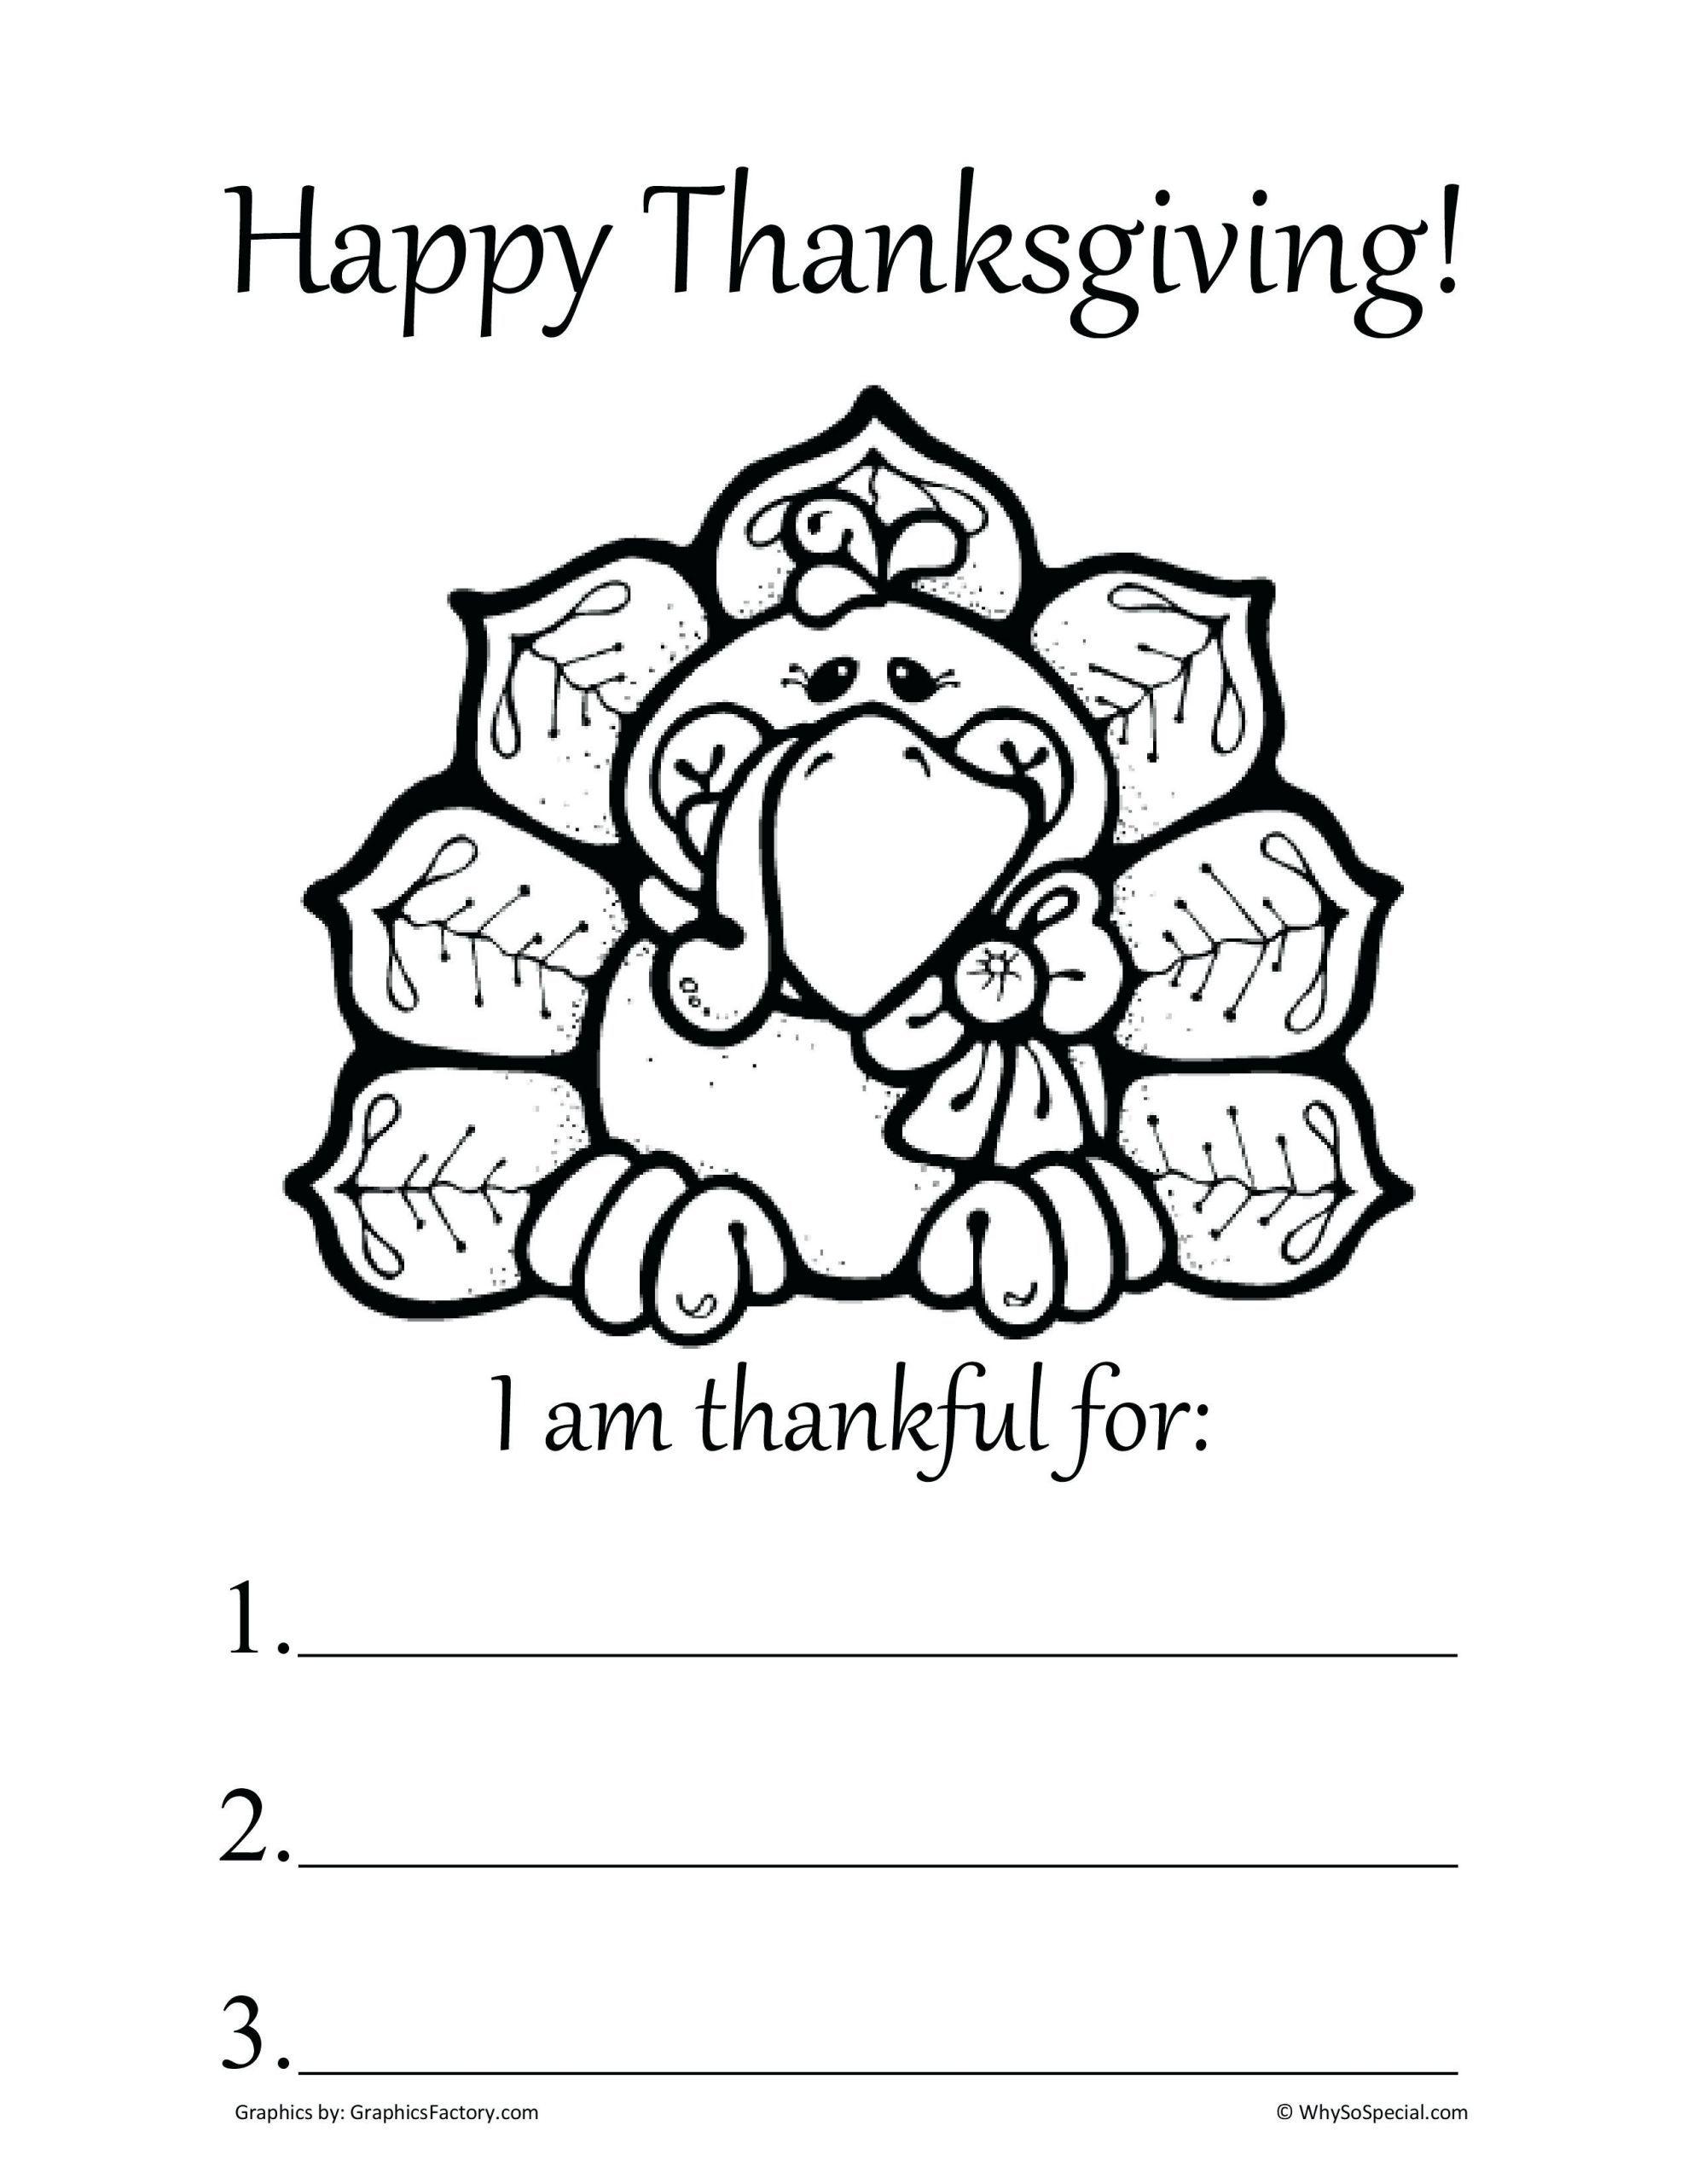 4 Free Math Worksheets Second Grade 2 Skip Counting Skip Counting by 50  thank…   Thanksgiving math worksheets [ 2560 x 1978 Pixel ]